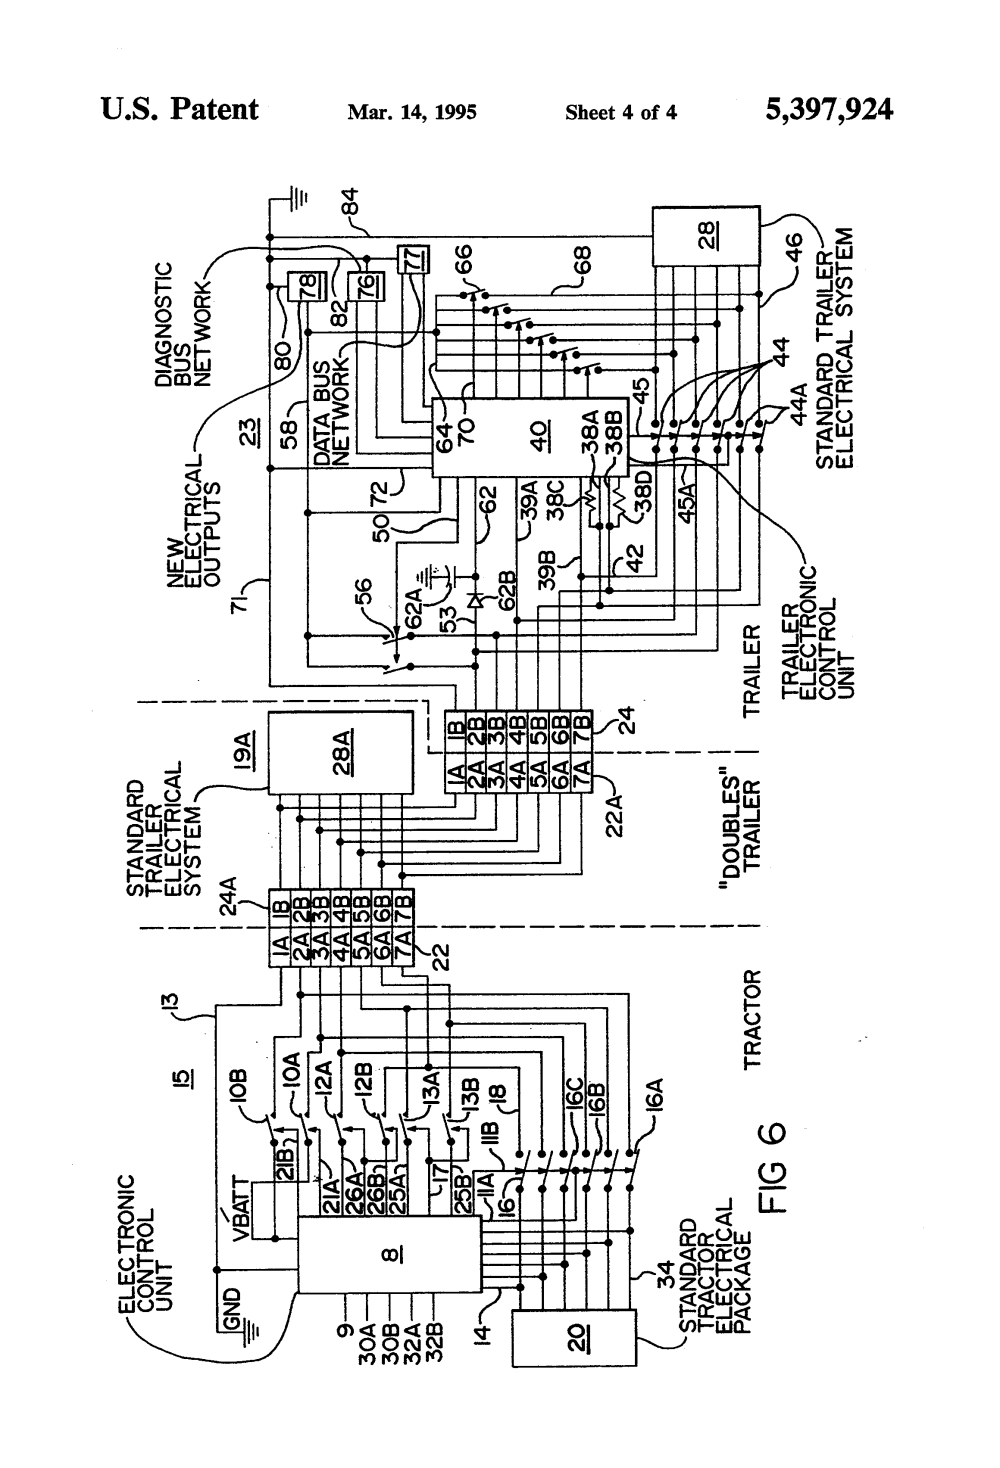 medium resolution of wiring diagram on moreover wabco abs wiring diagram besides mack as well 2001 hyundai santa fe fuel pump wiring on wabco abs harness